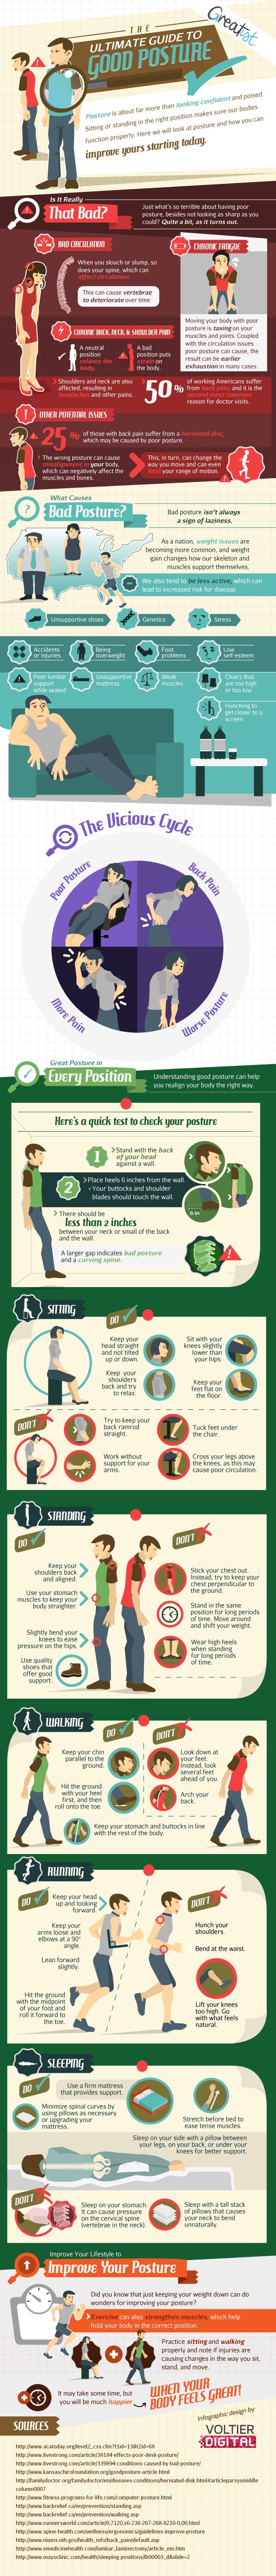 Good-Posture-Guide